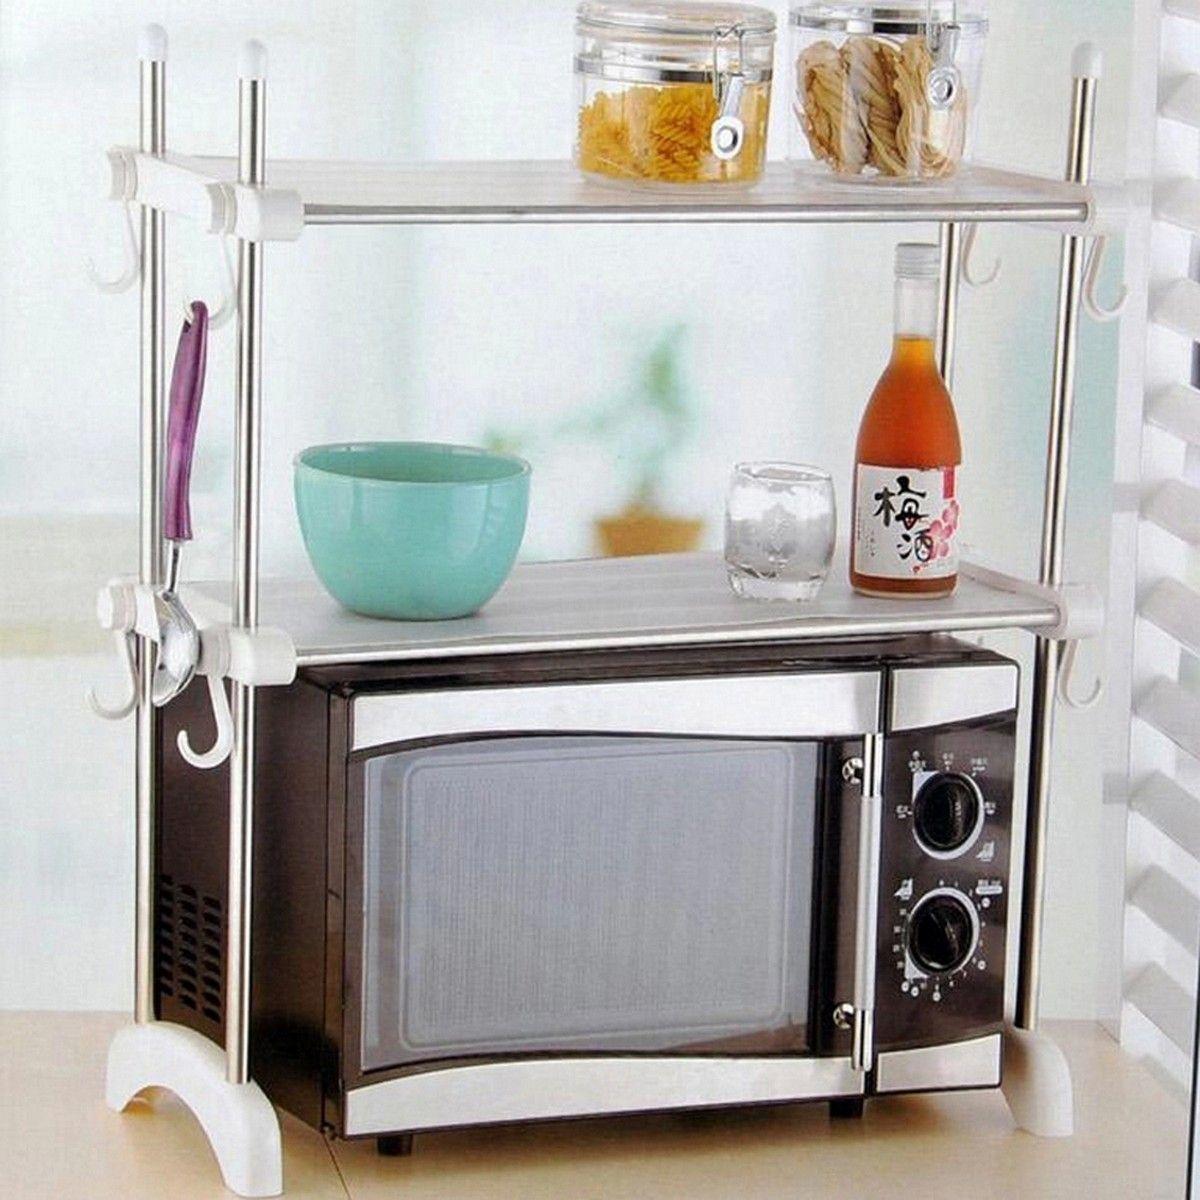 Kitchen shelves for microwave - Kawachi Kitchen Microwave Oven Racks Double Bowl Stainless Steel Rack K195